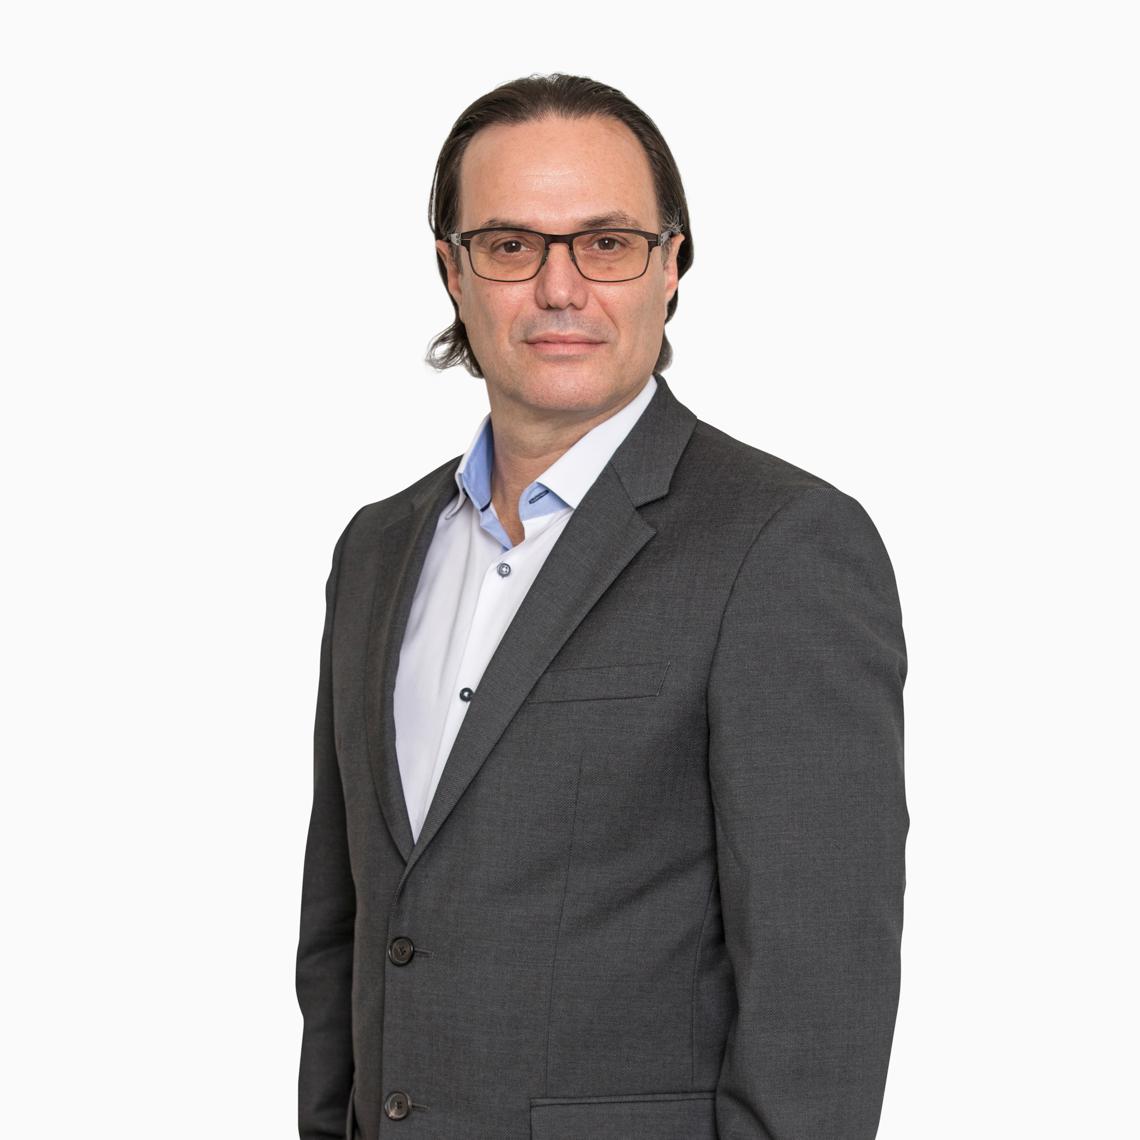 BernardSteinberg.jpg